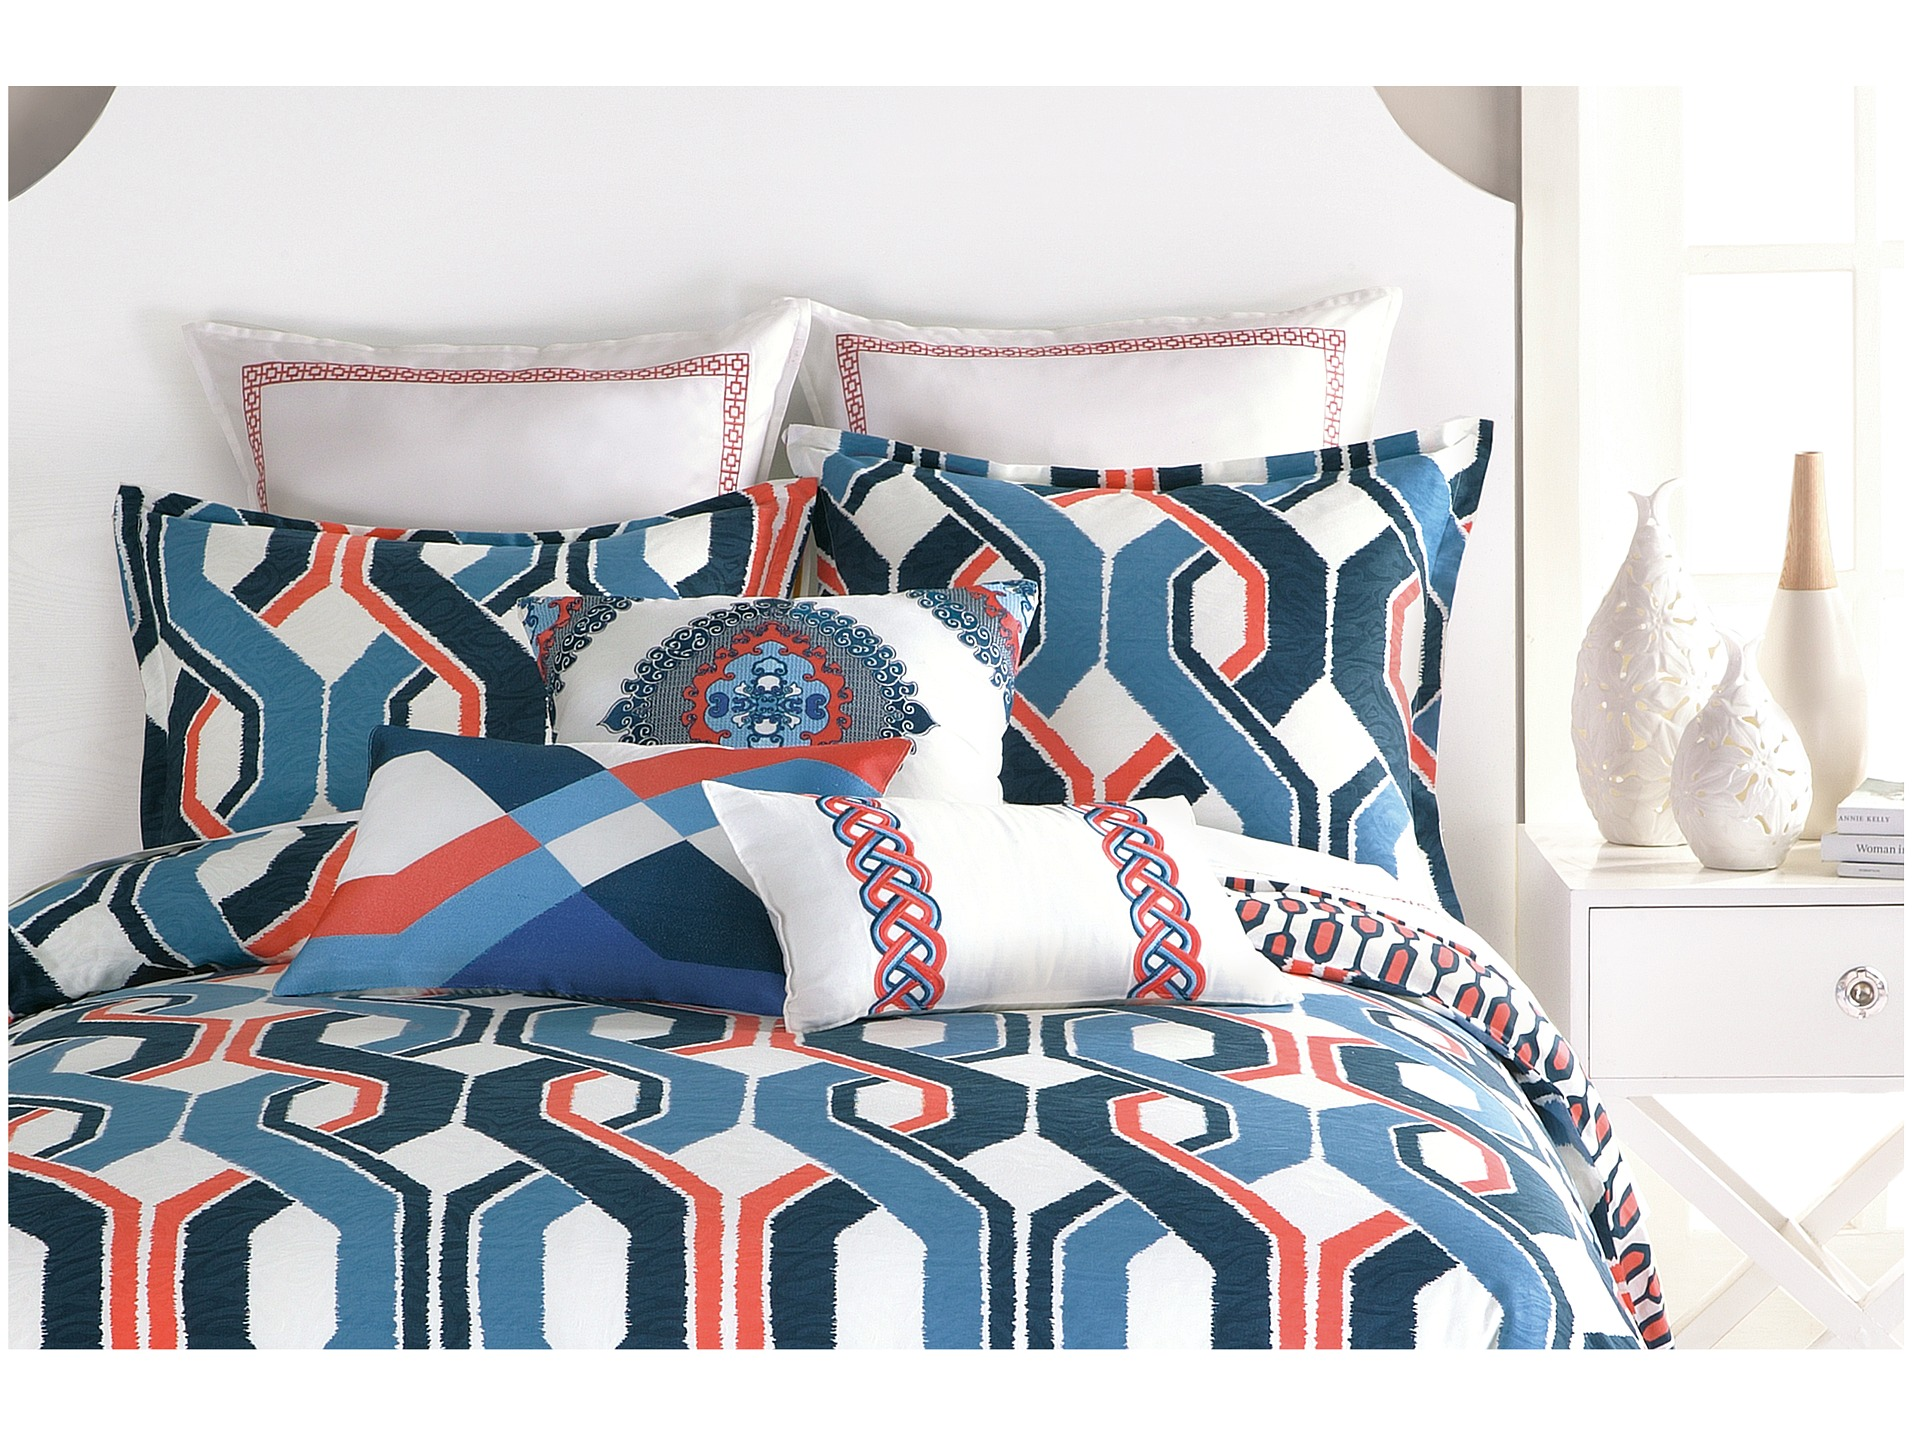 Trina turk coastline ikat comforter set twin twin xl shipped free at